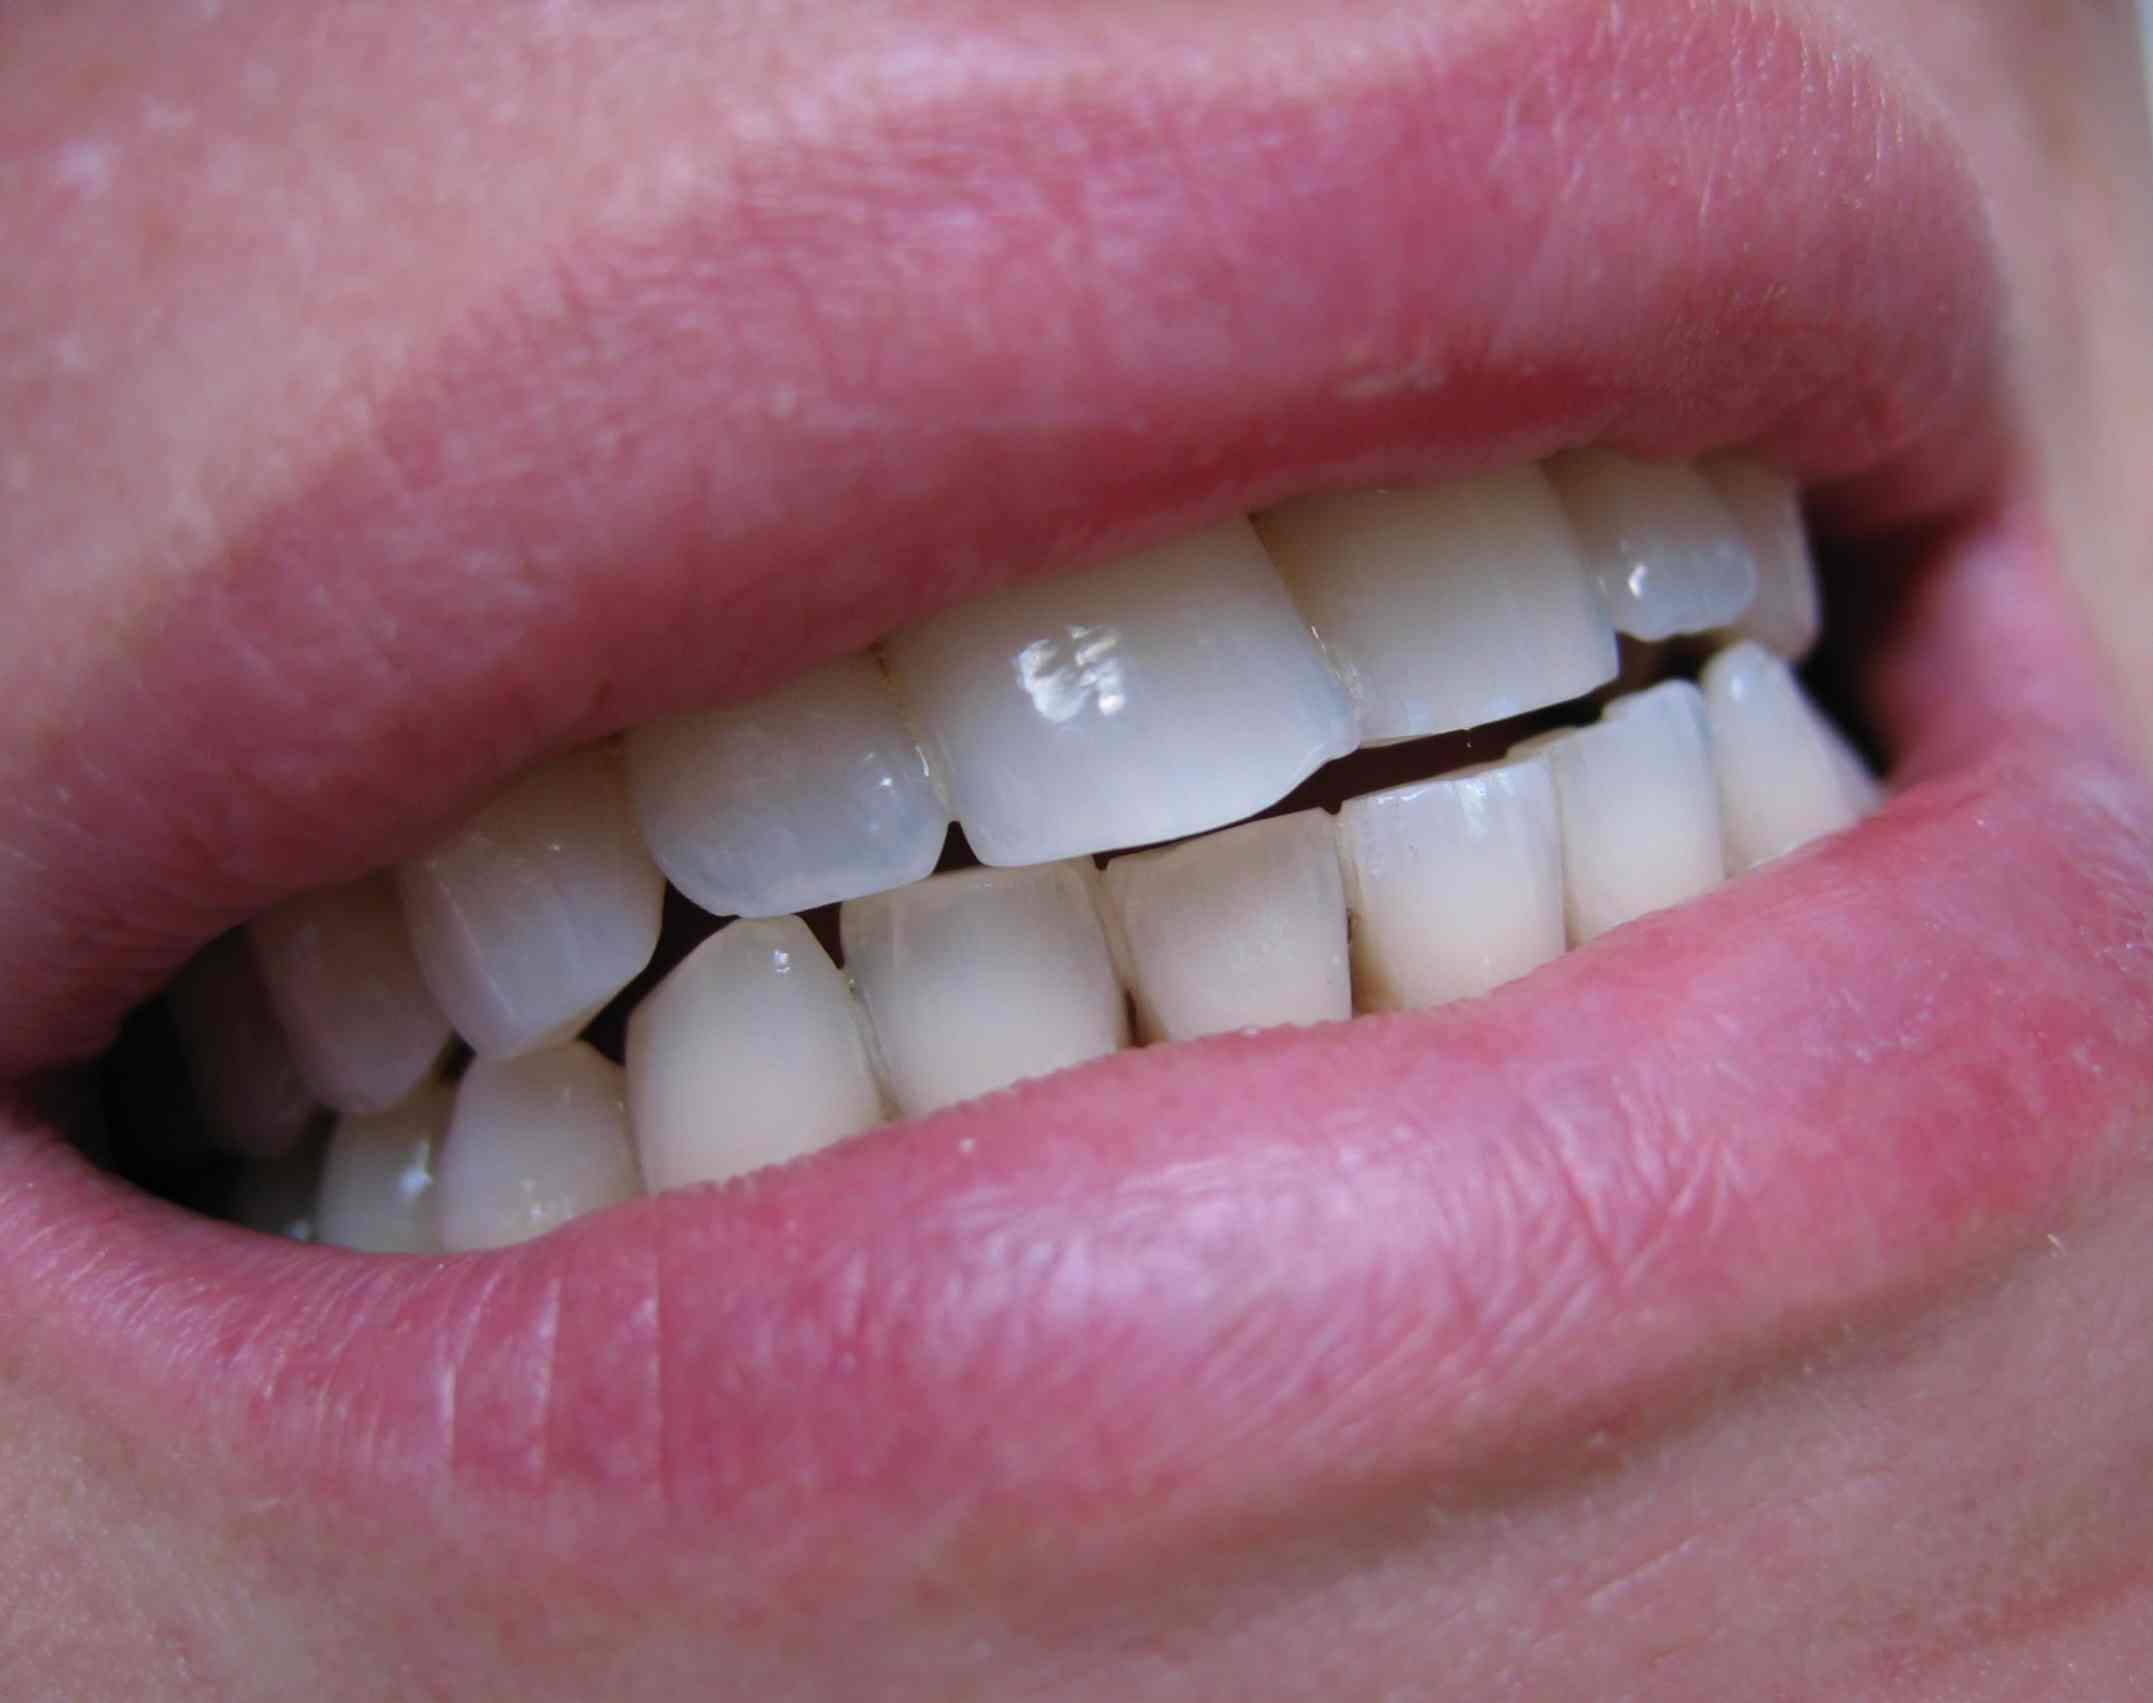 indications dent blanche blanchiment dentaire blanchiement dentaire whitening technique mode. Black Bedroom Furniture Sets. Home Design Ideas